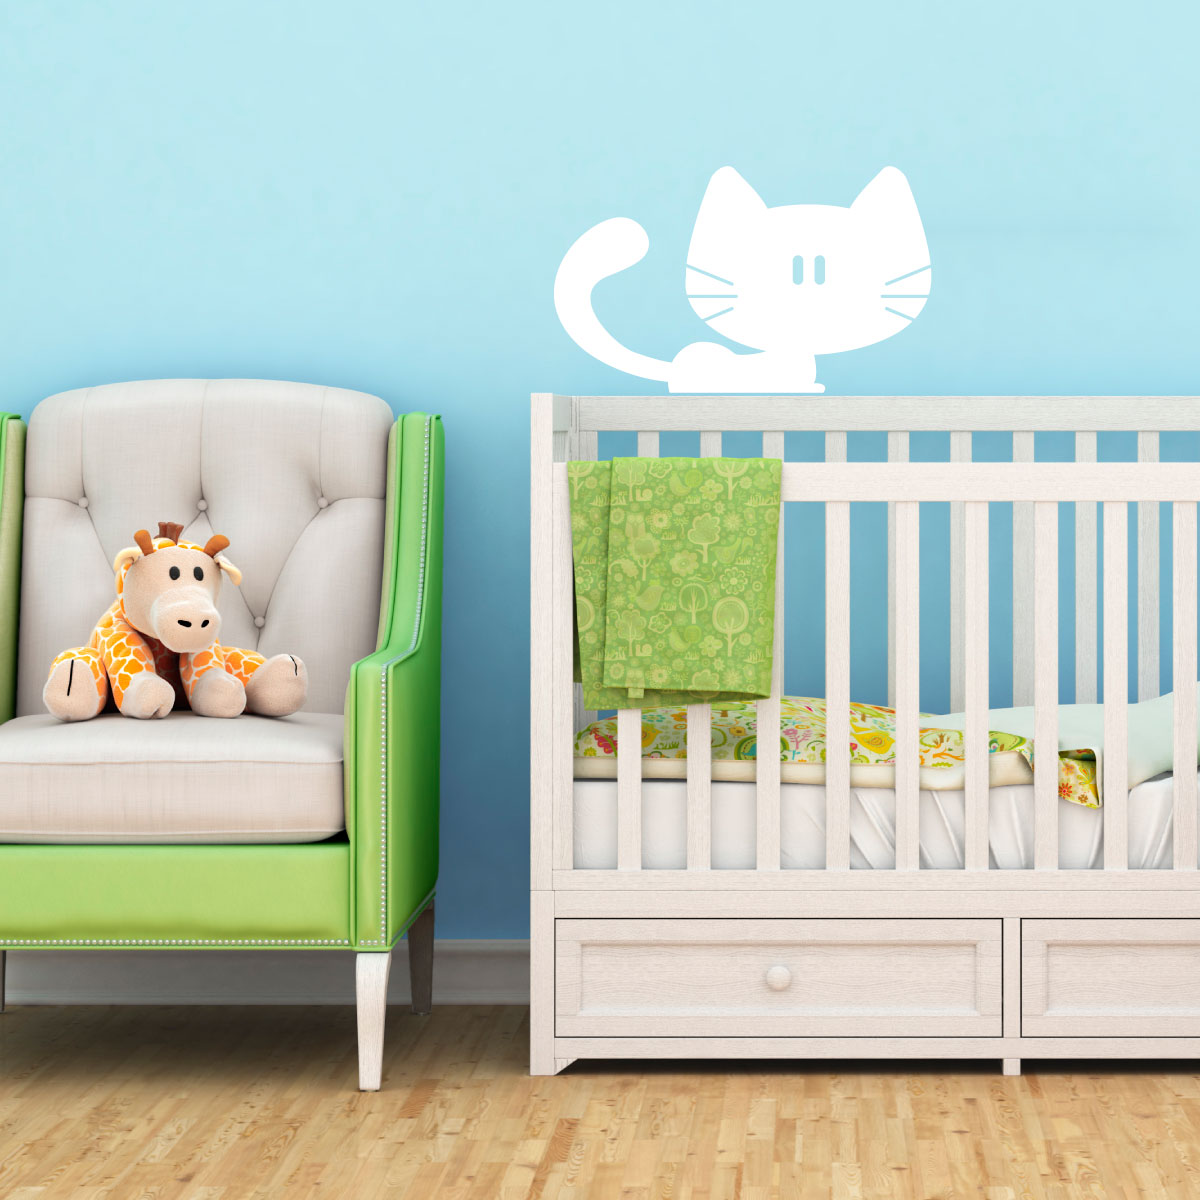 sticker chat mignon stickers salle de jeux animaux ambiance sticker. Black Bedroom Furniture Sets. Home Design Ideas